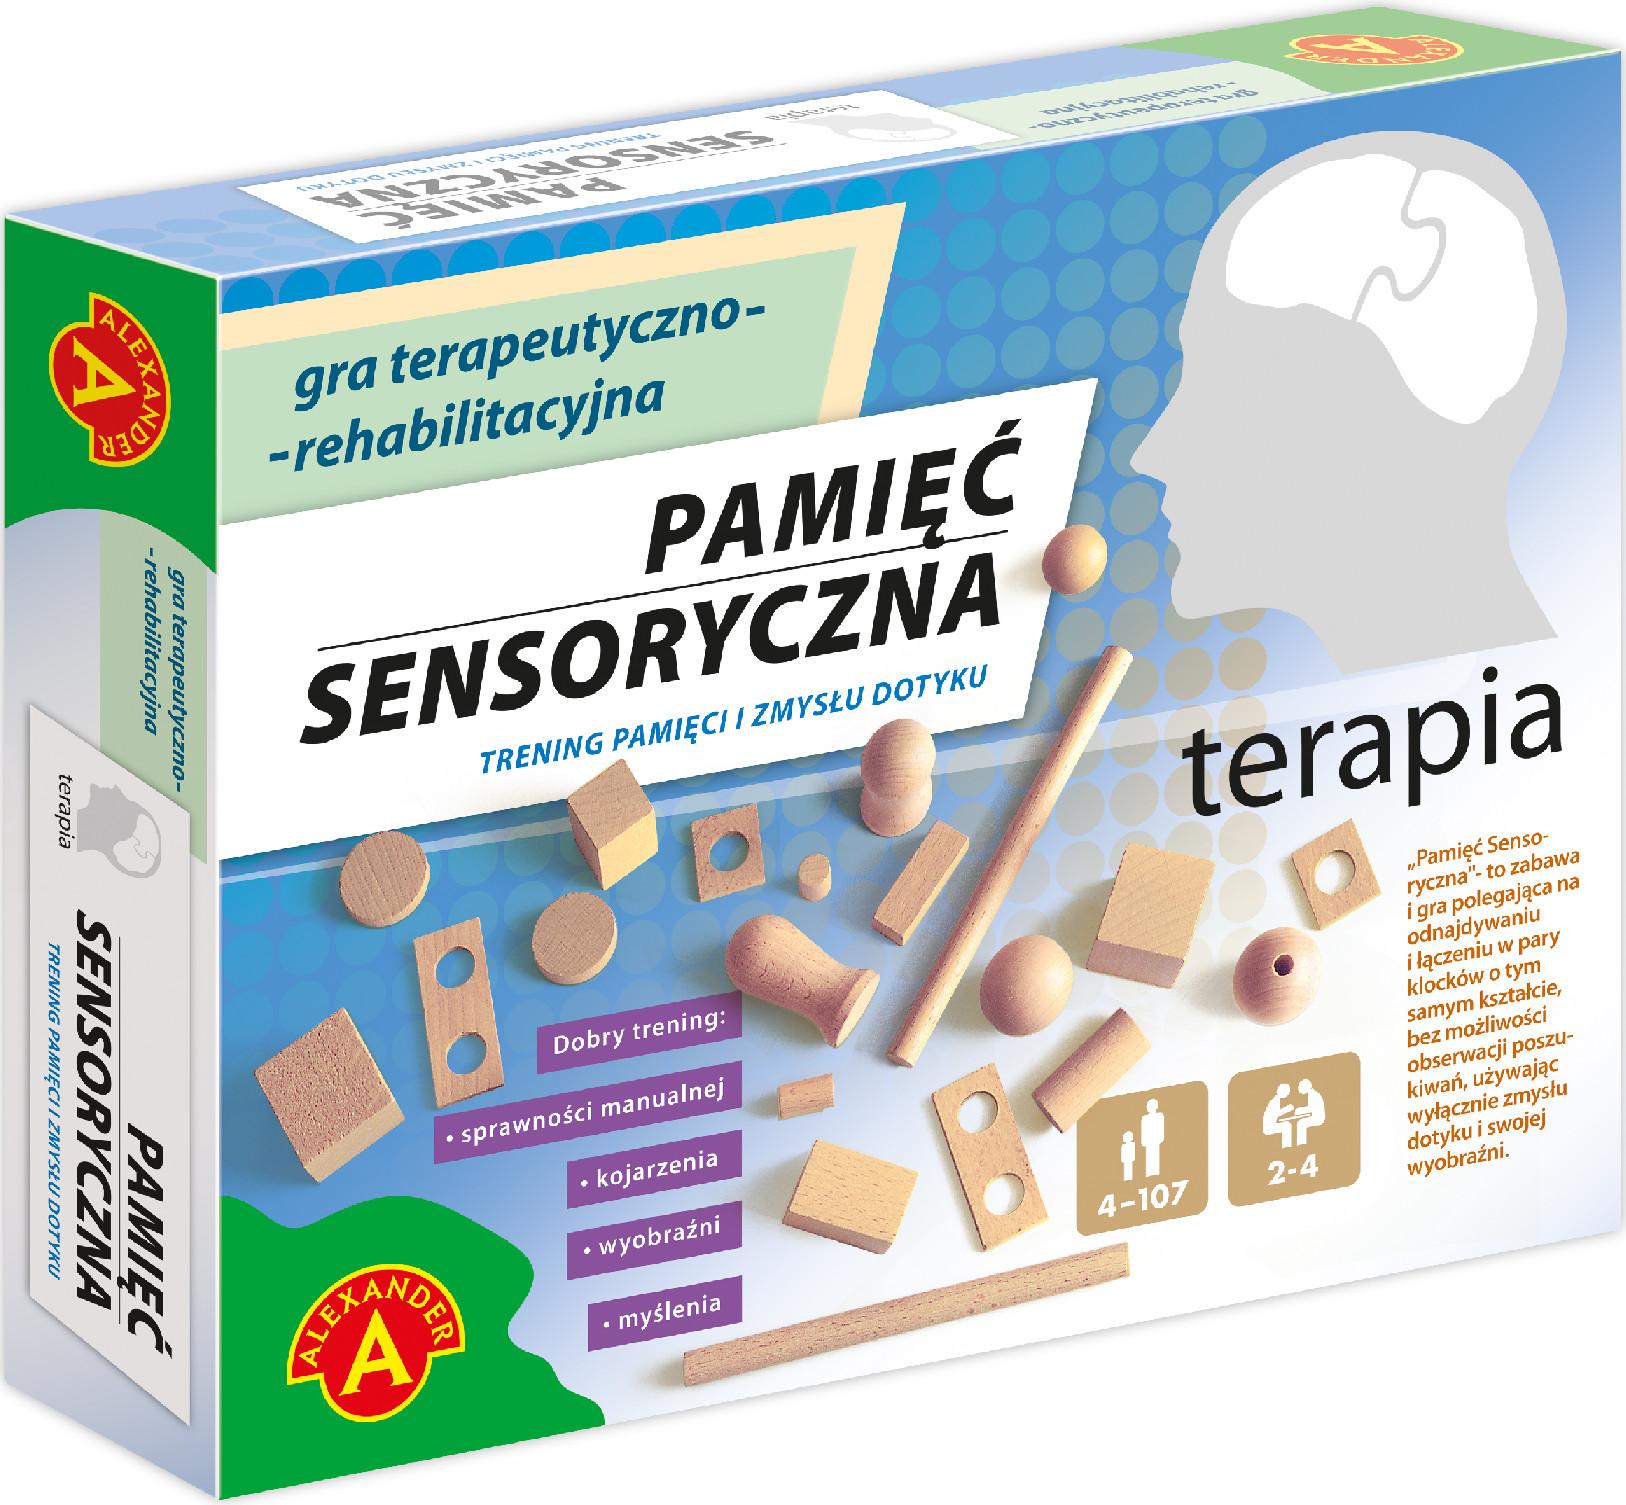 Alexander Terapia Pamięć sensoryczna